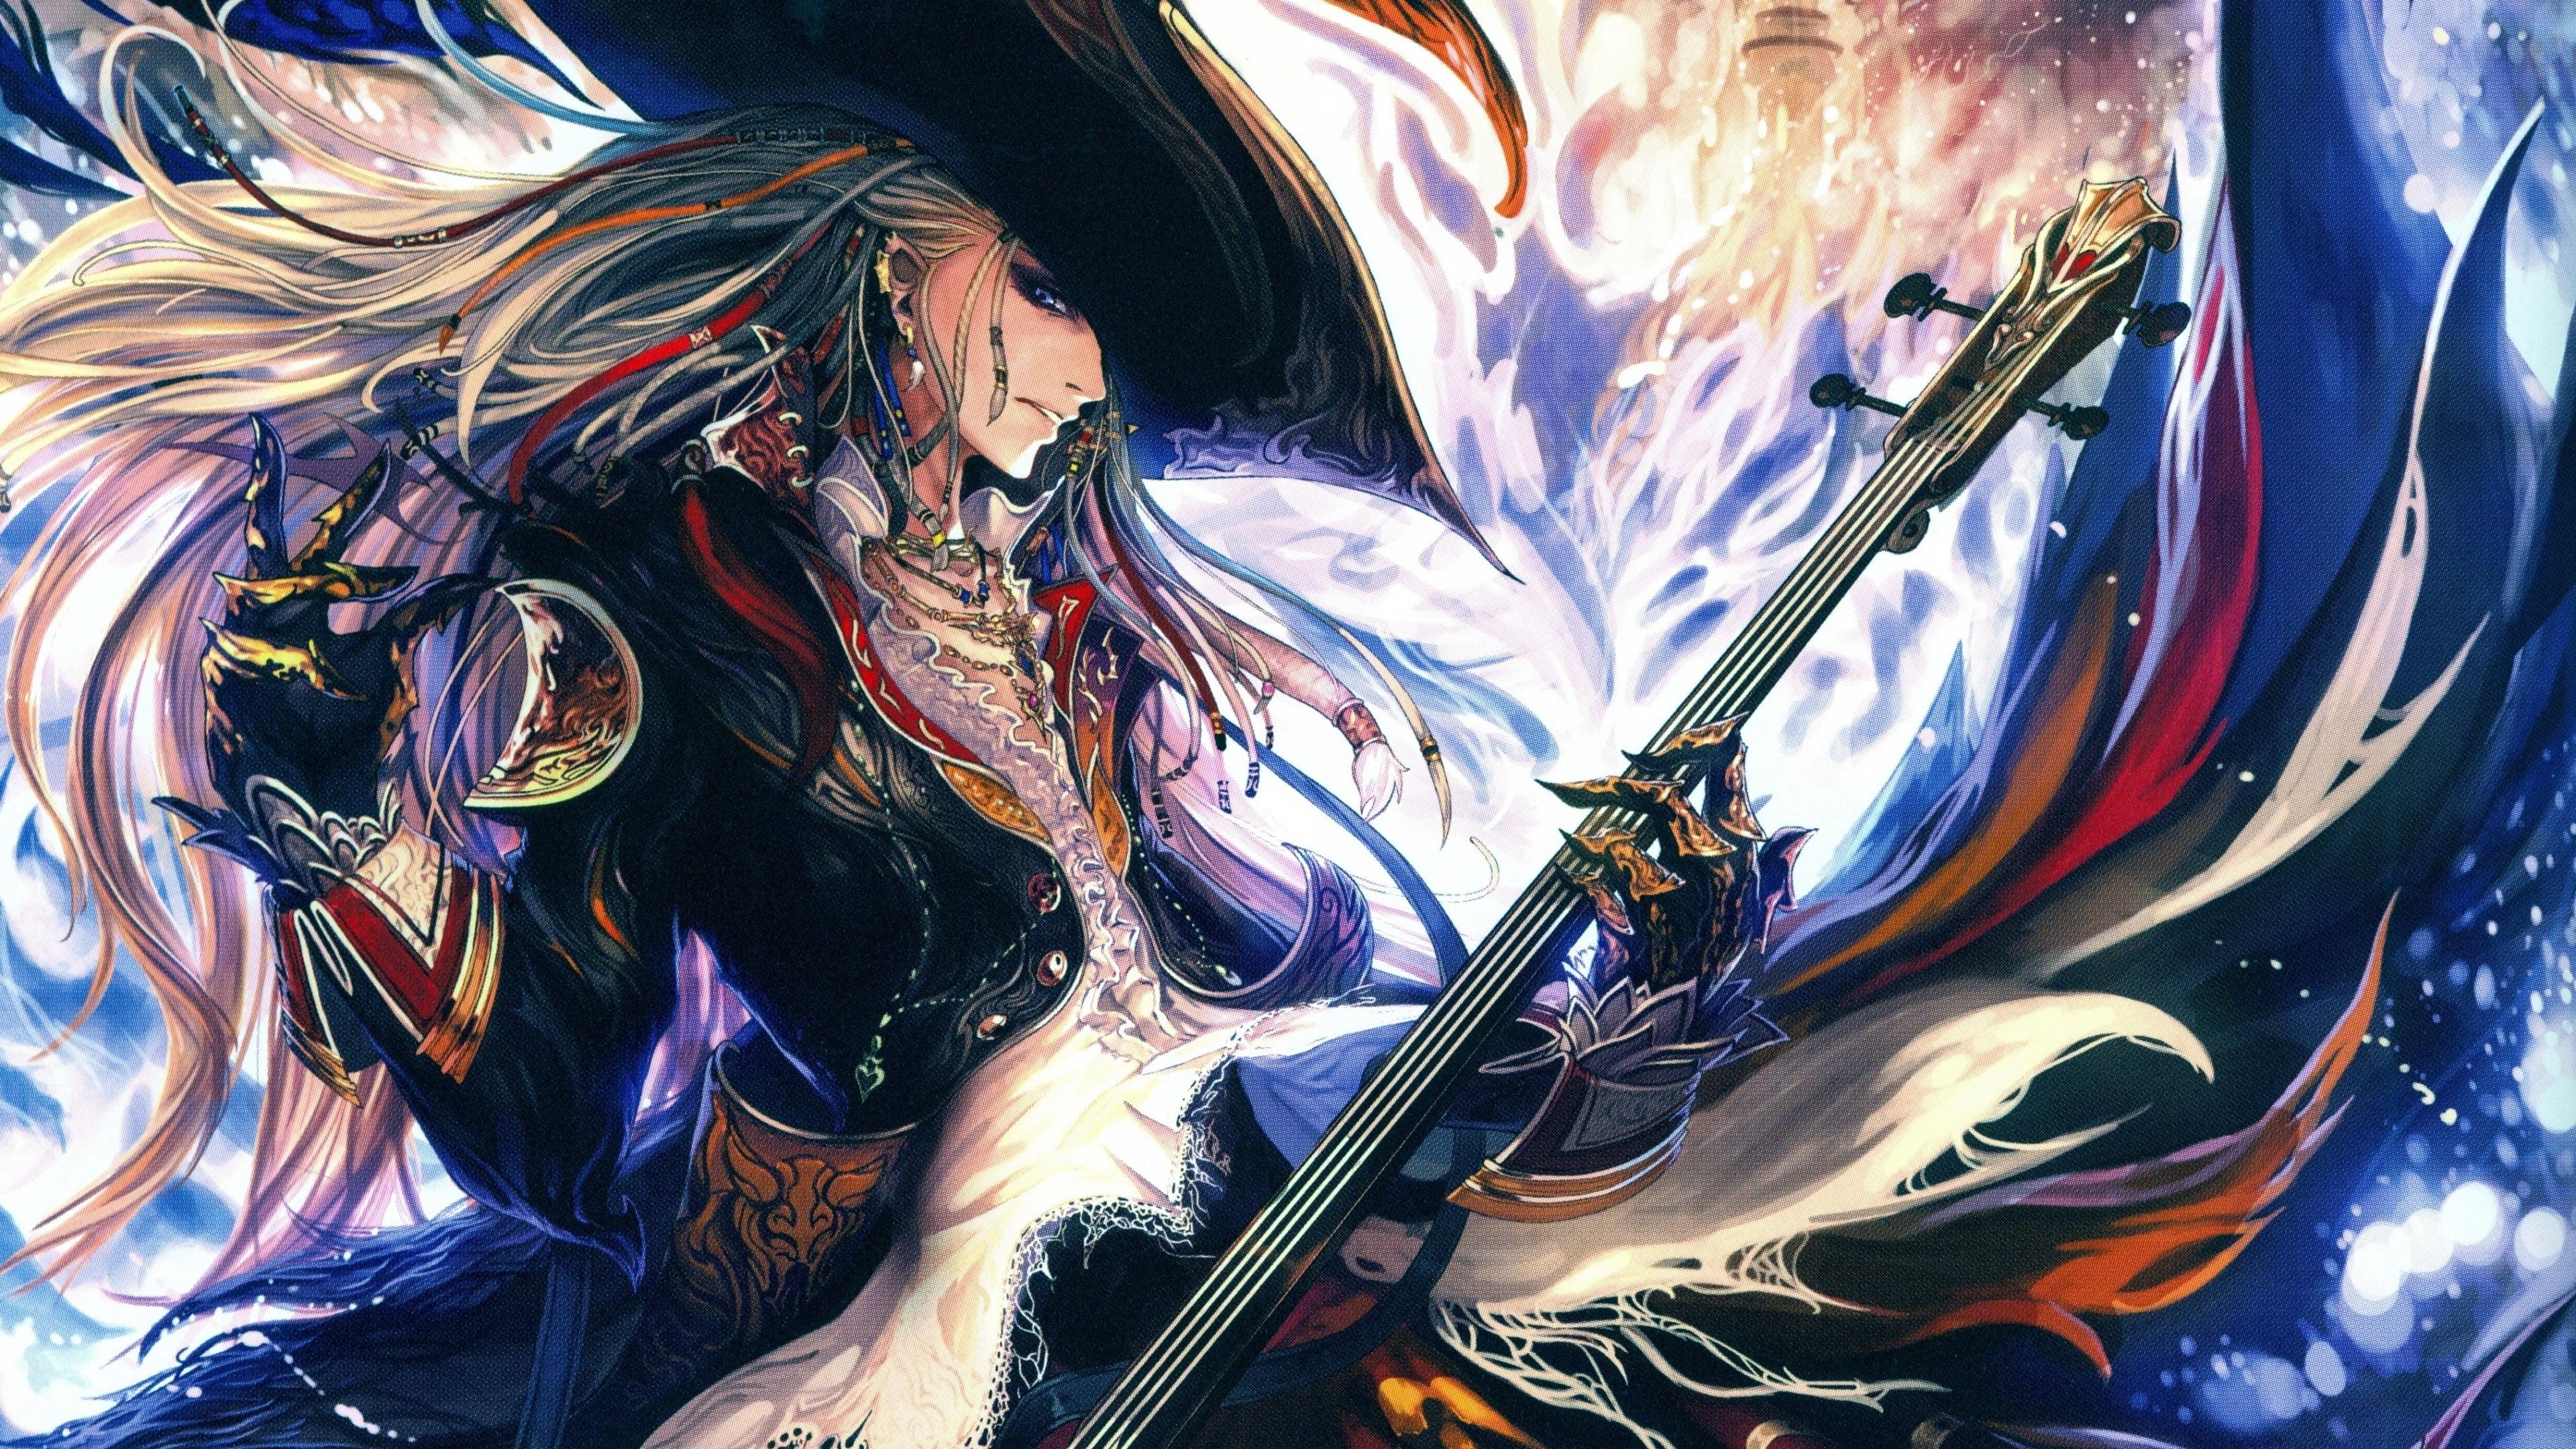 Anime Wallpaper for Windows 10 (78+ images)